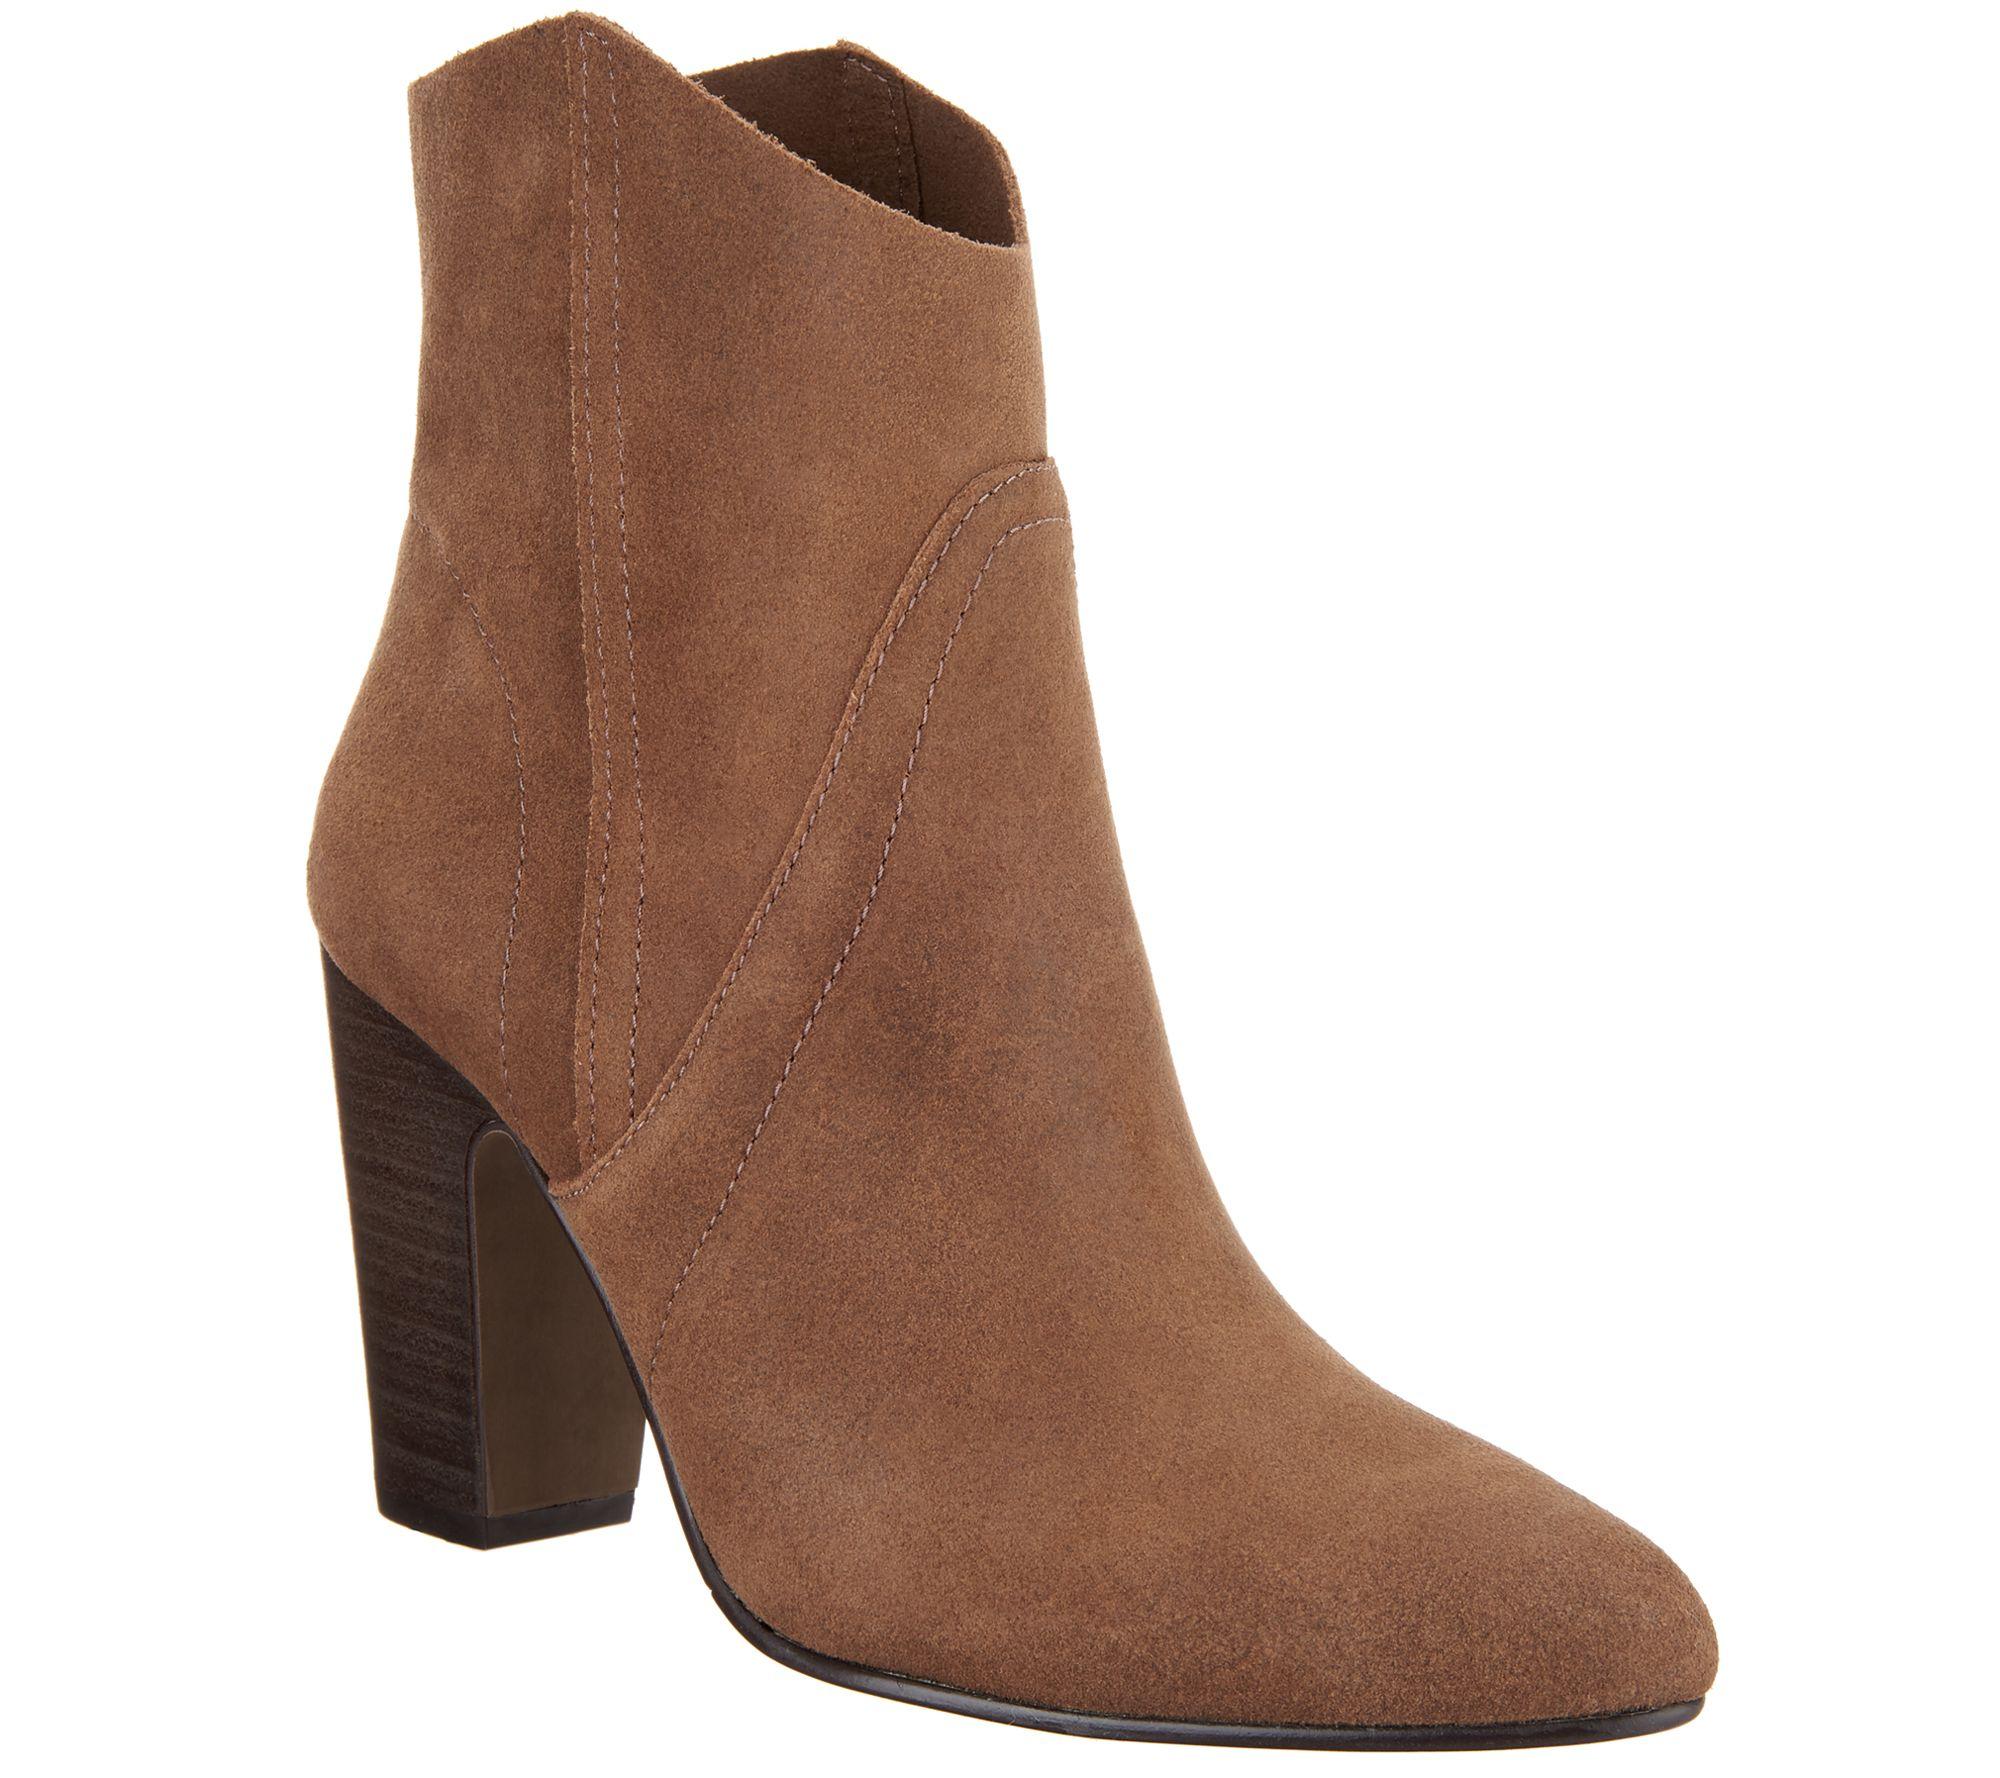 7303f6555c2 Vince Camuto Suede Ankle Boots - Creestal — QVC.com